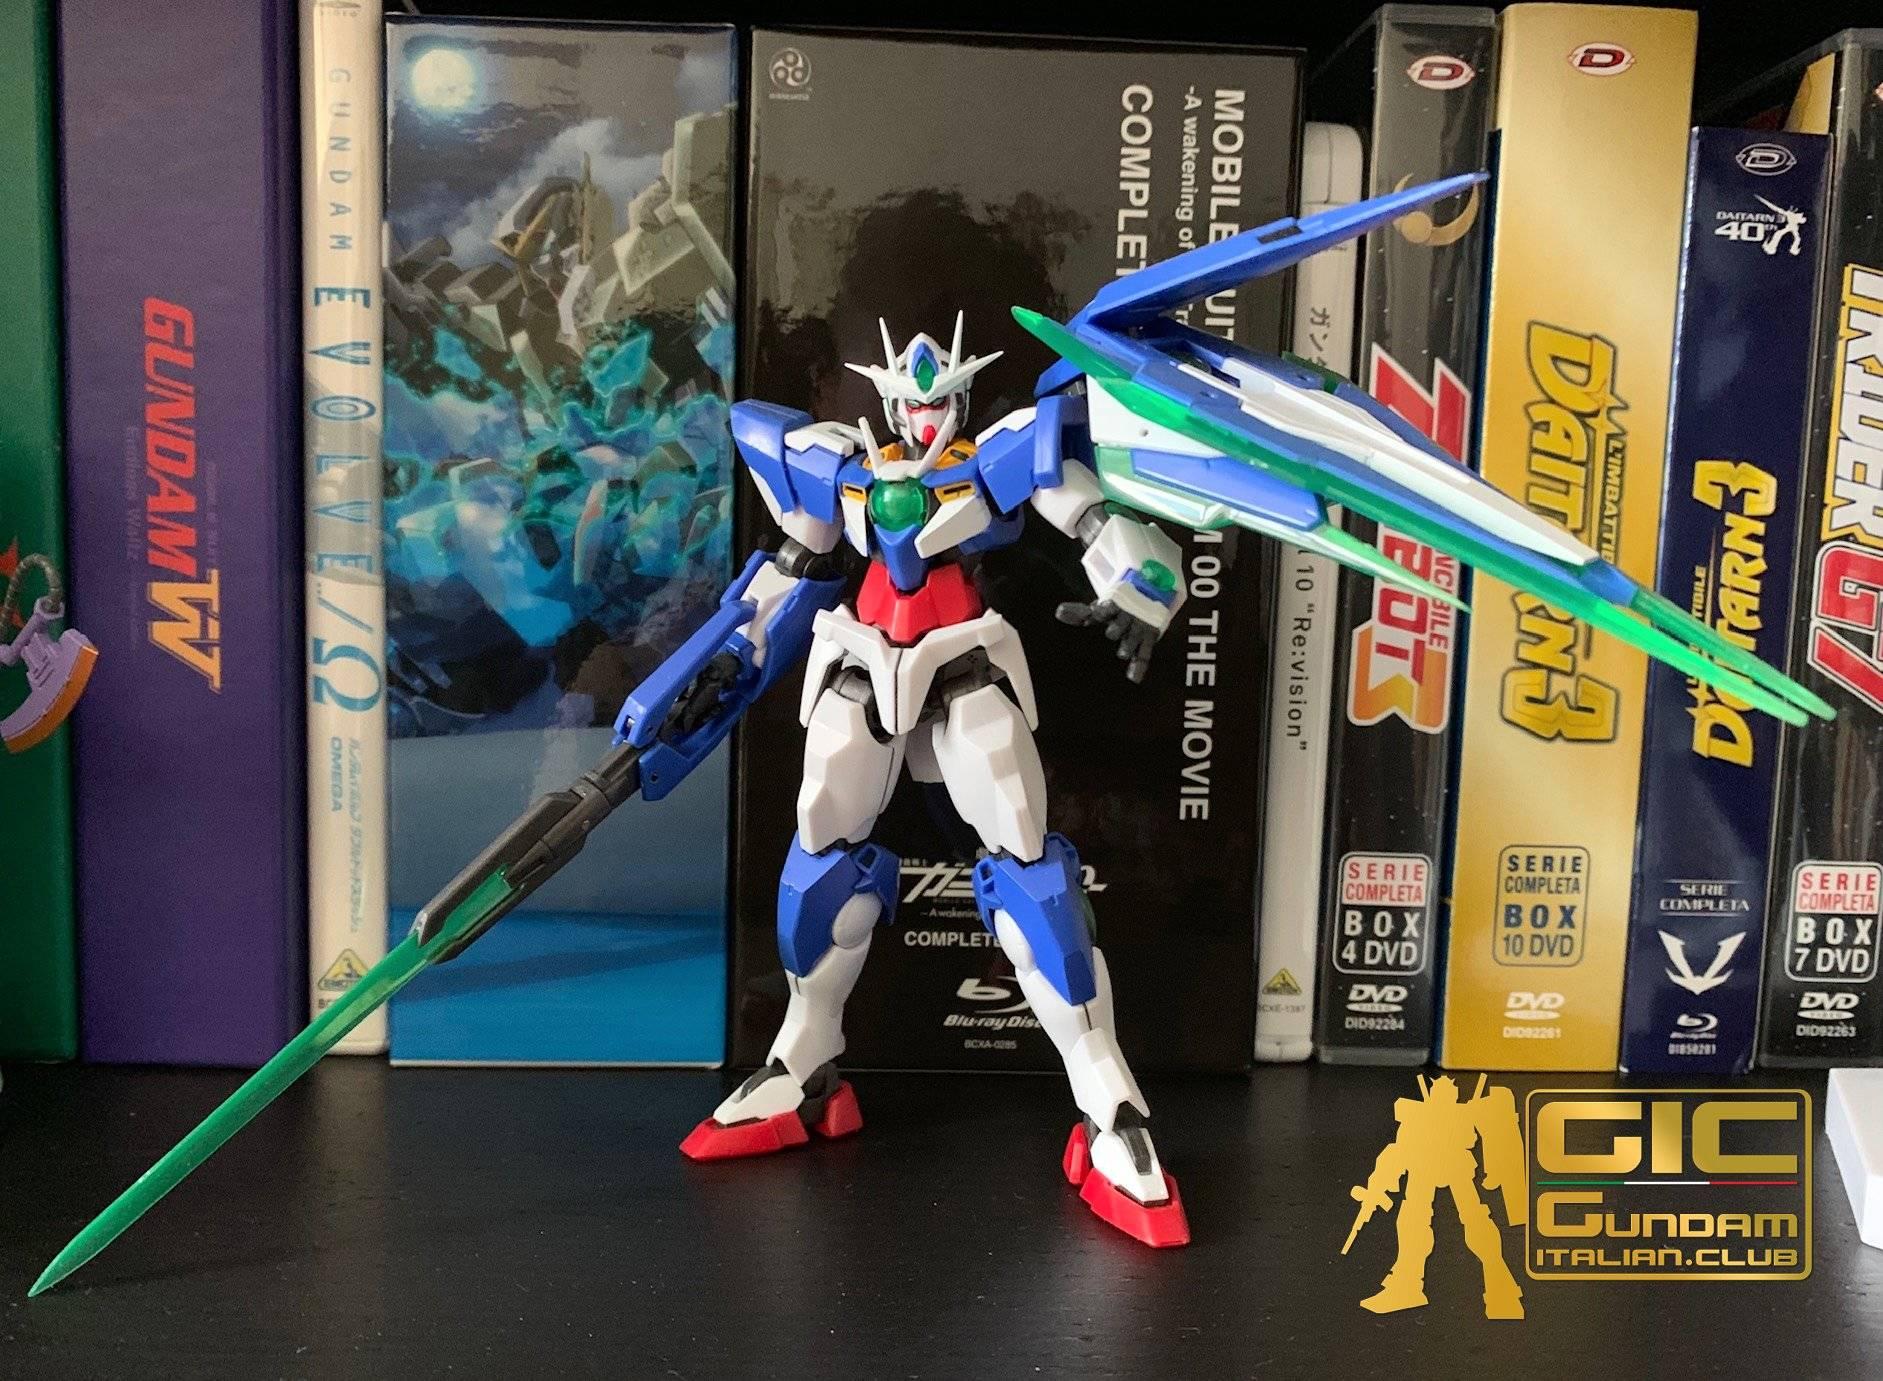 Gundam Action Figures